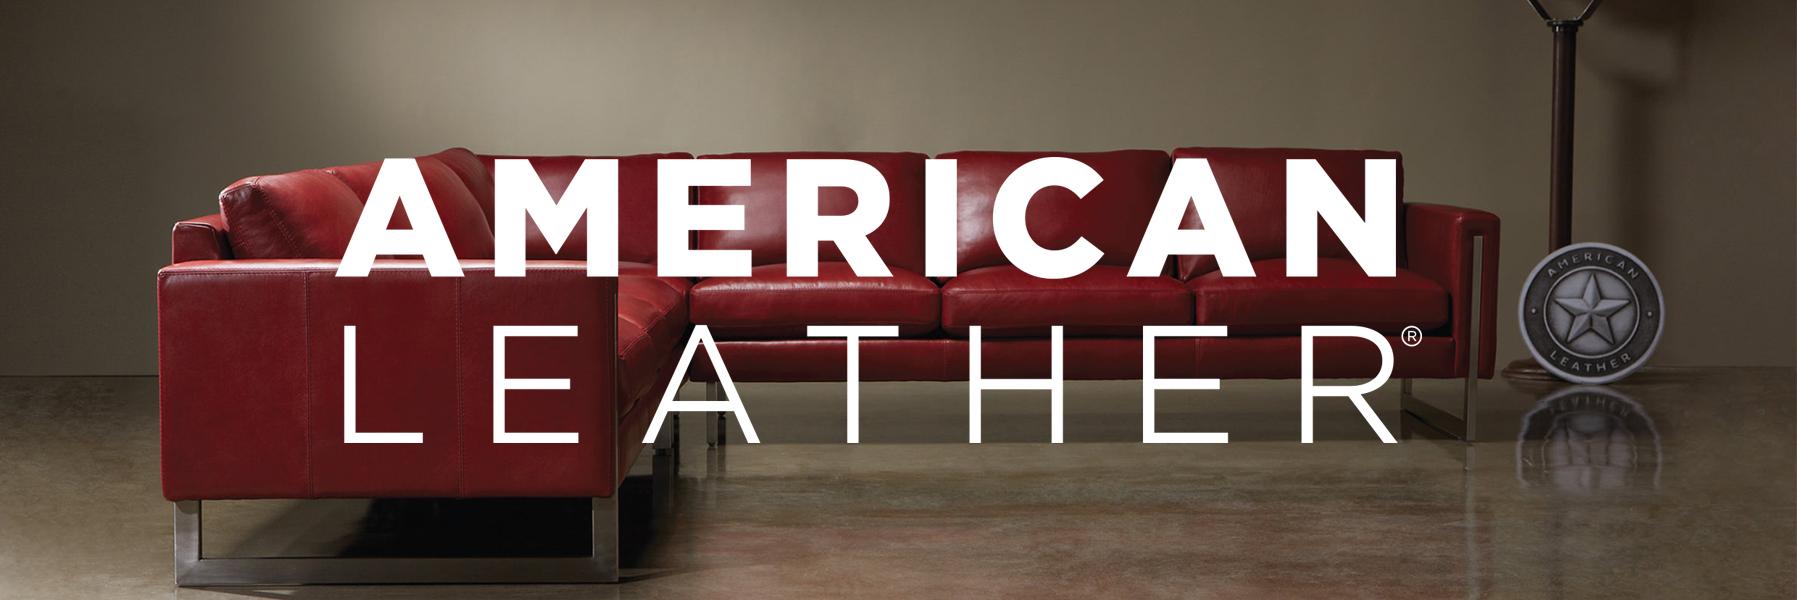 american_leather_splash_2.jpg